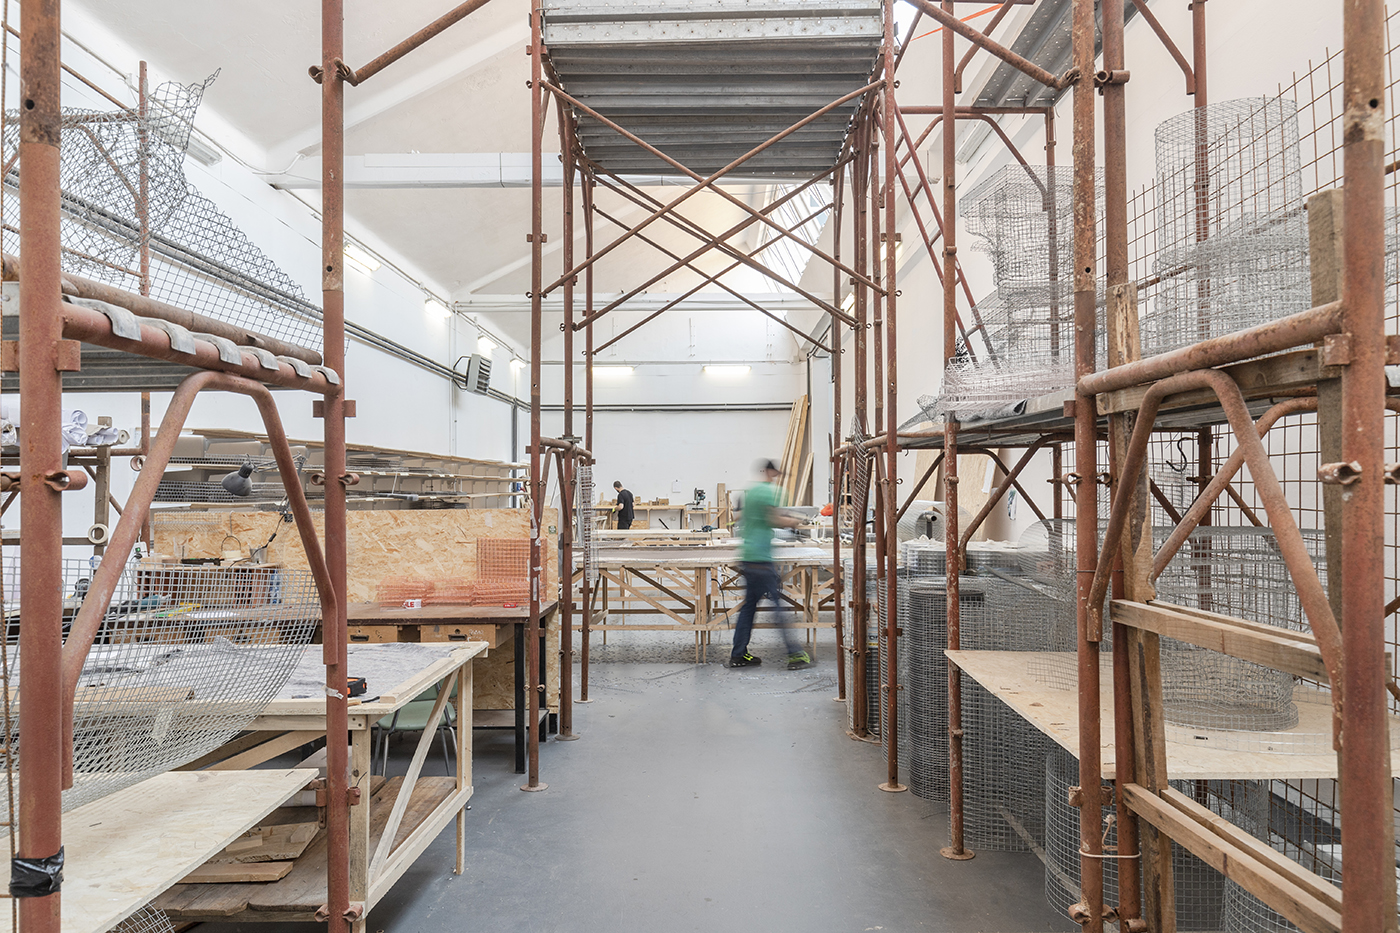 Tresoldi Studio - Edoardo Tresoldi